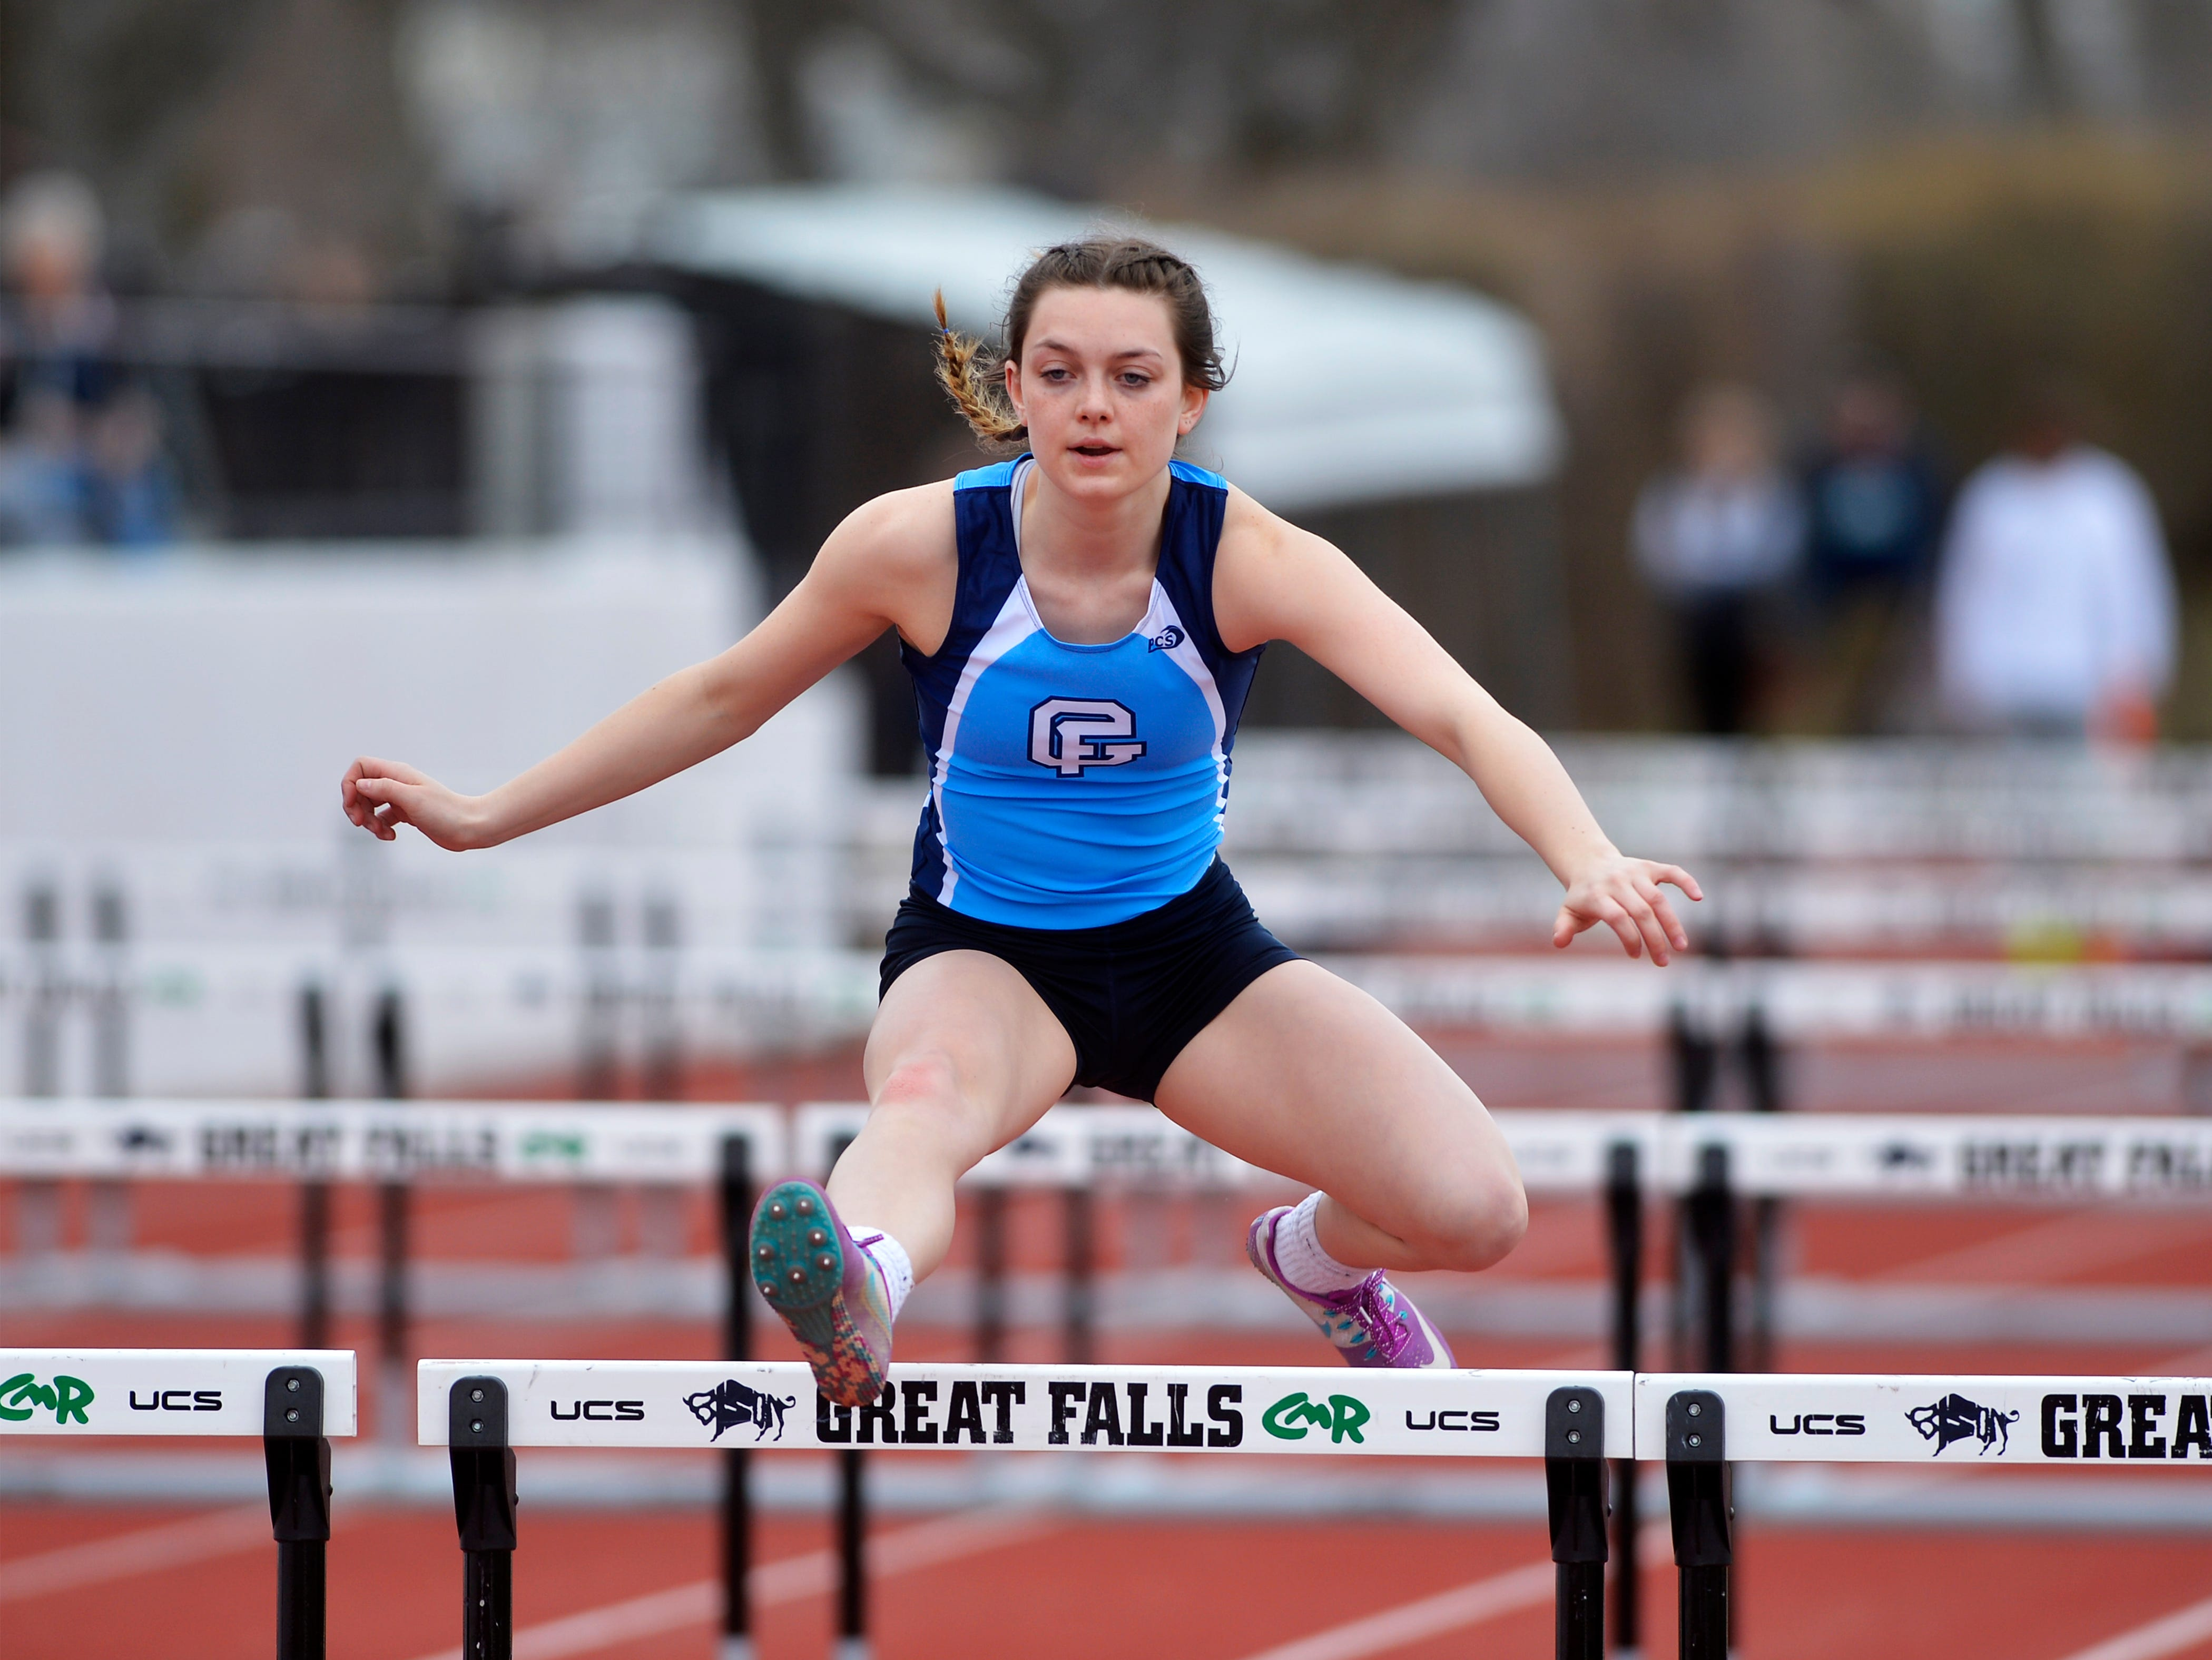 Great Falls High's Maraya Christiansen runs in the 100m hurdles in Friday's track meet against Glacier.